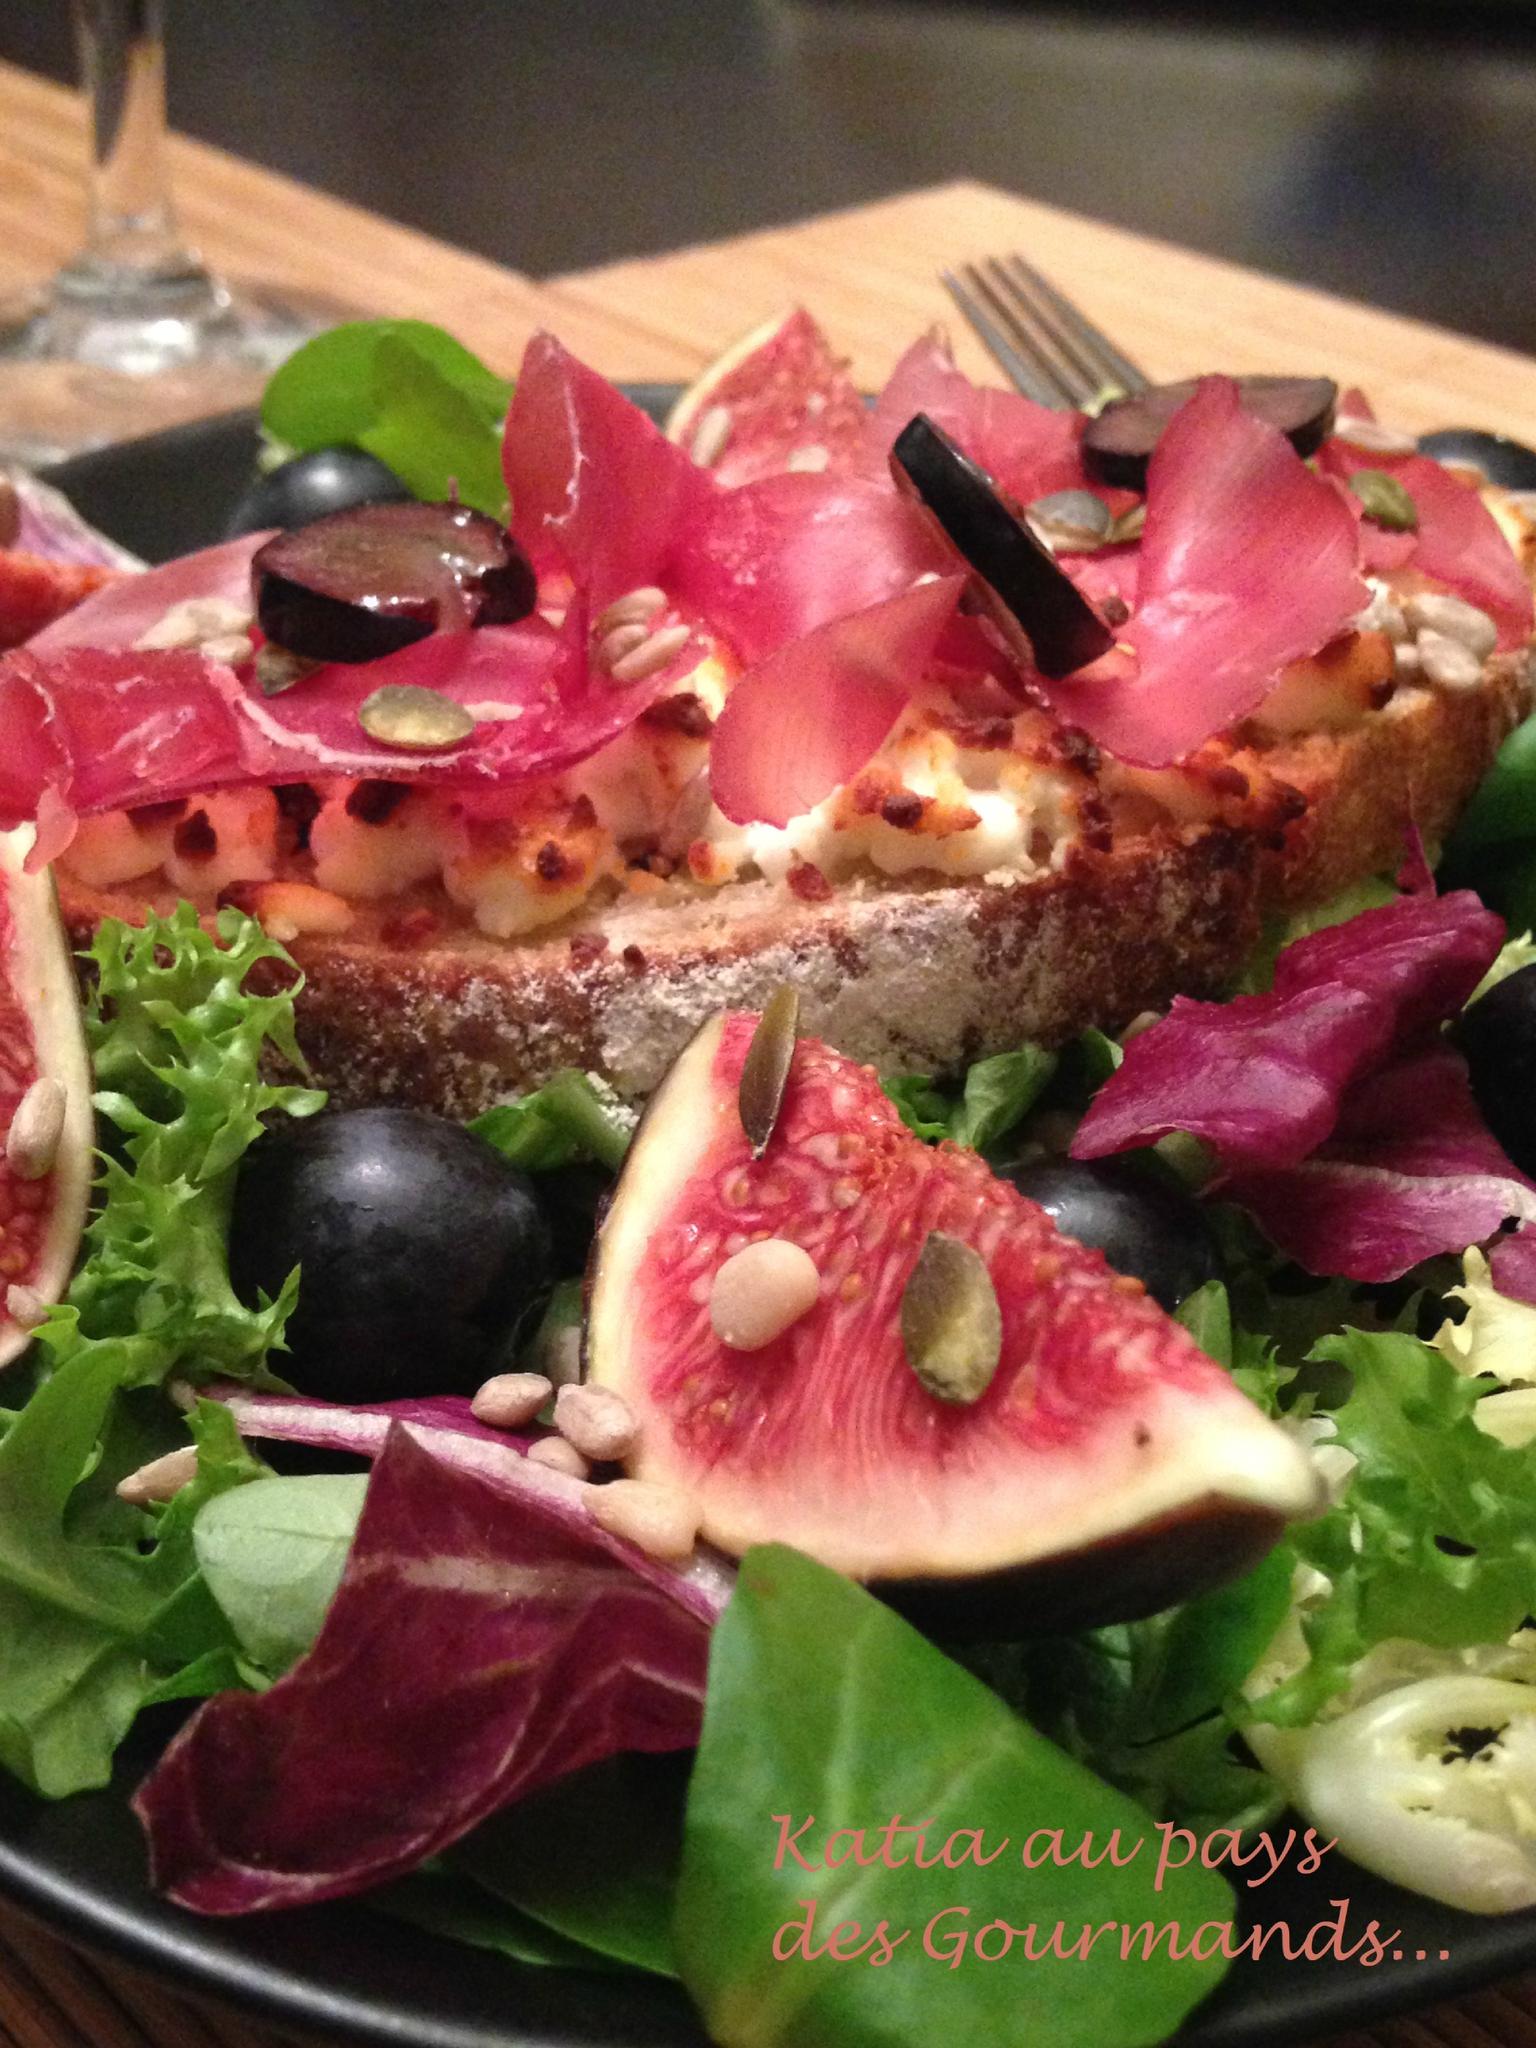 Salade et tartines gourmandes